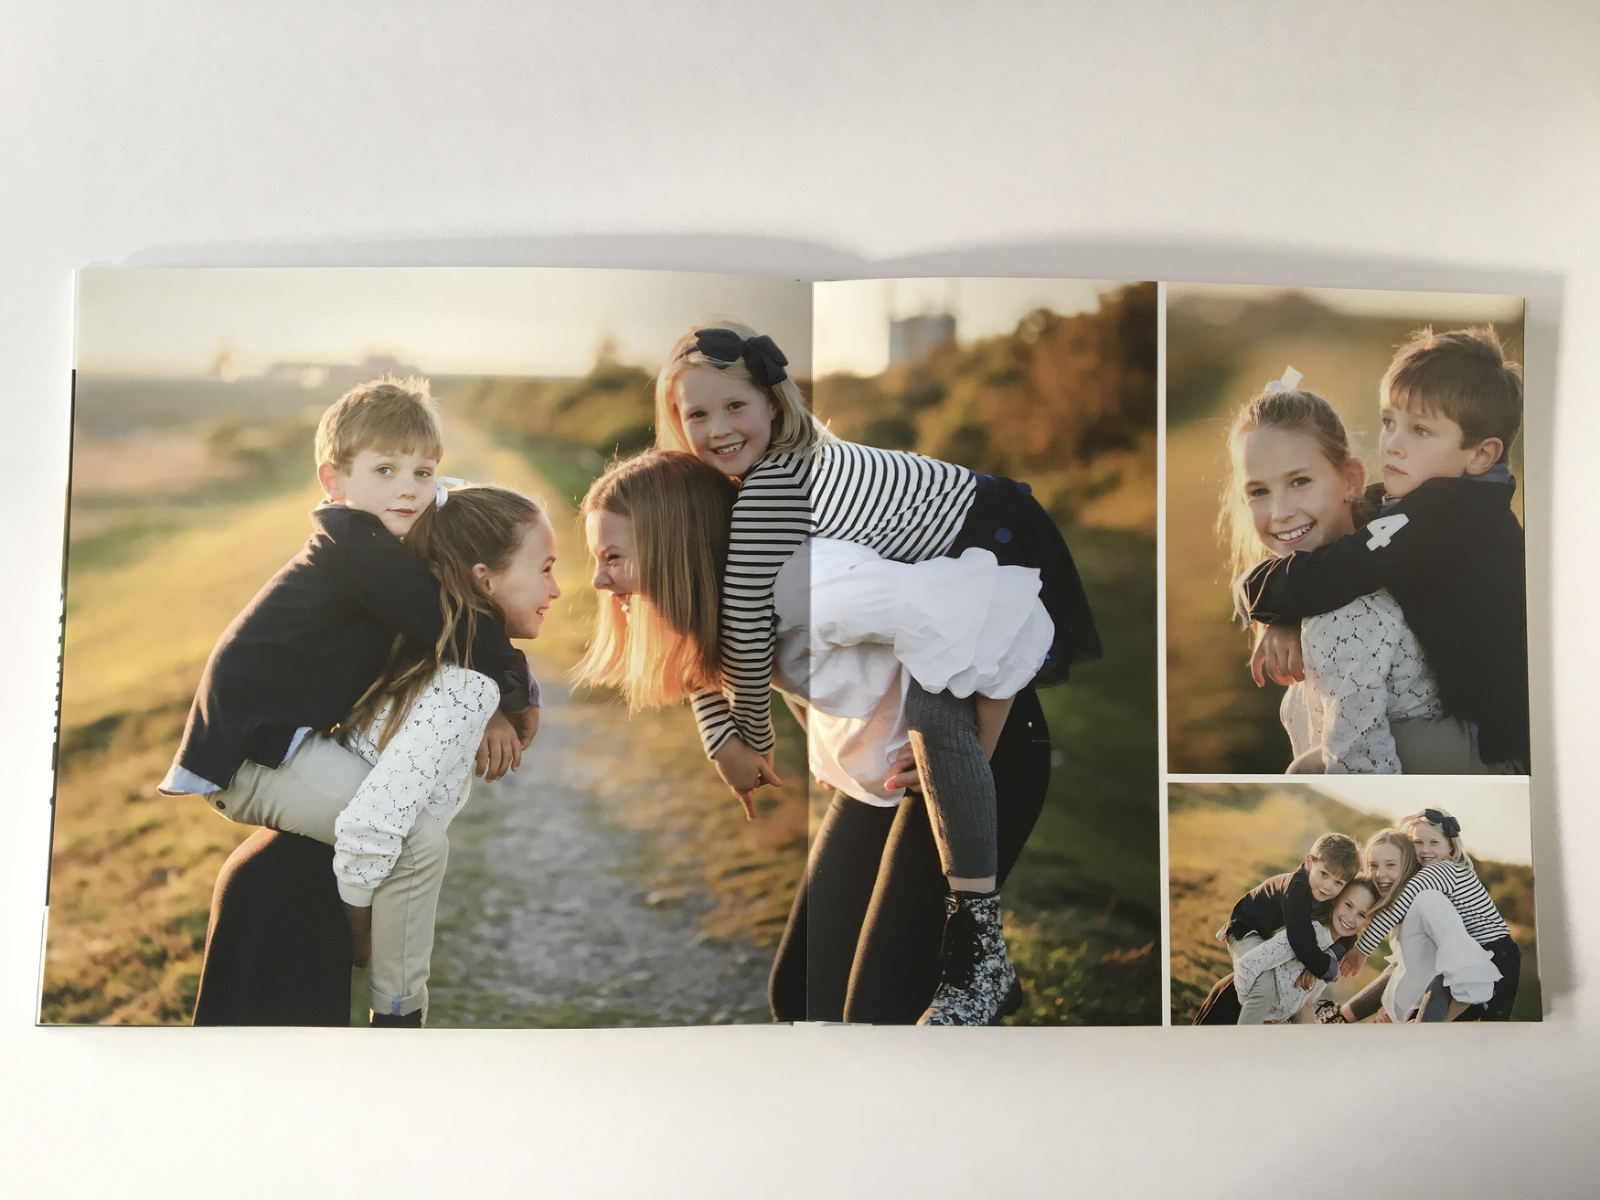 barnfotograf, sommarerbjudande, fotograf skåne, fotograf helsingborg, fotograf ramlösa, familjefotograf, mw photo&design, fotograf marie Walter, bakom kulisserna, produkter, fotoprodukter, hantverk, printstudio